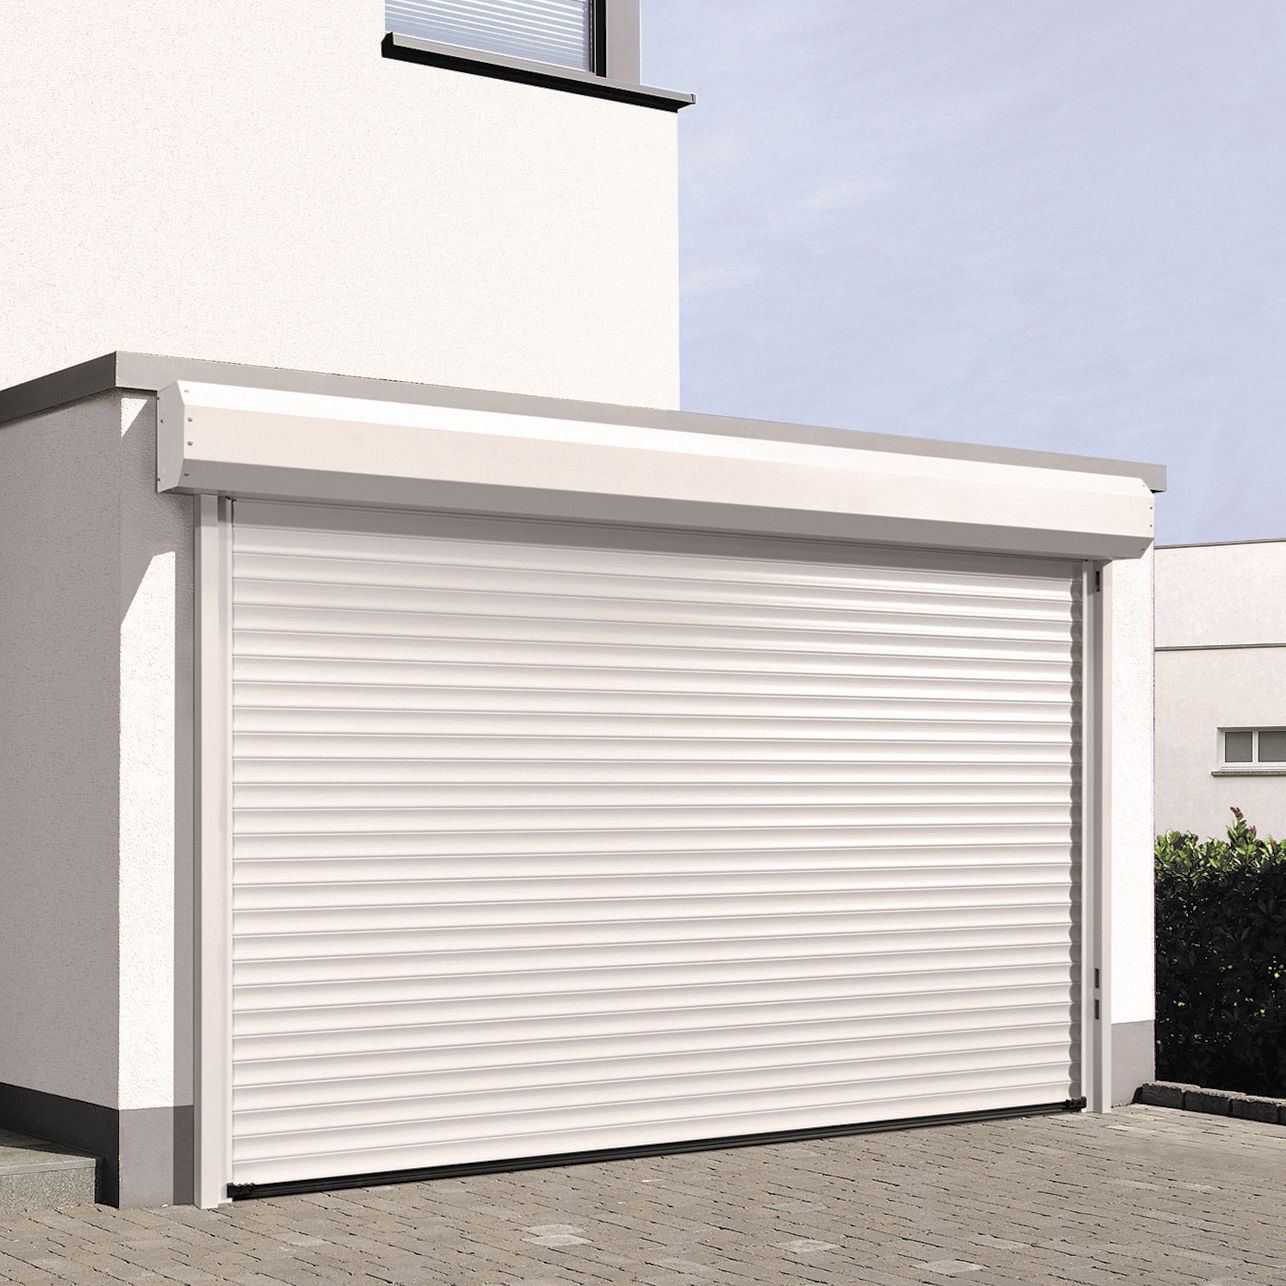 Roll Up Garage Door Aluminum Automatic Insulated